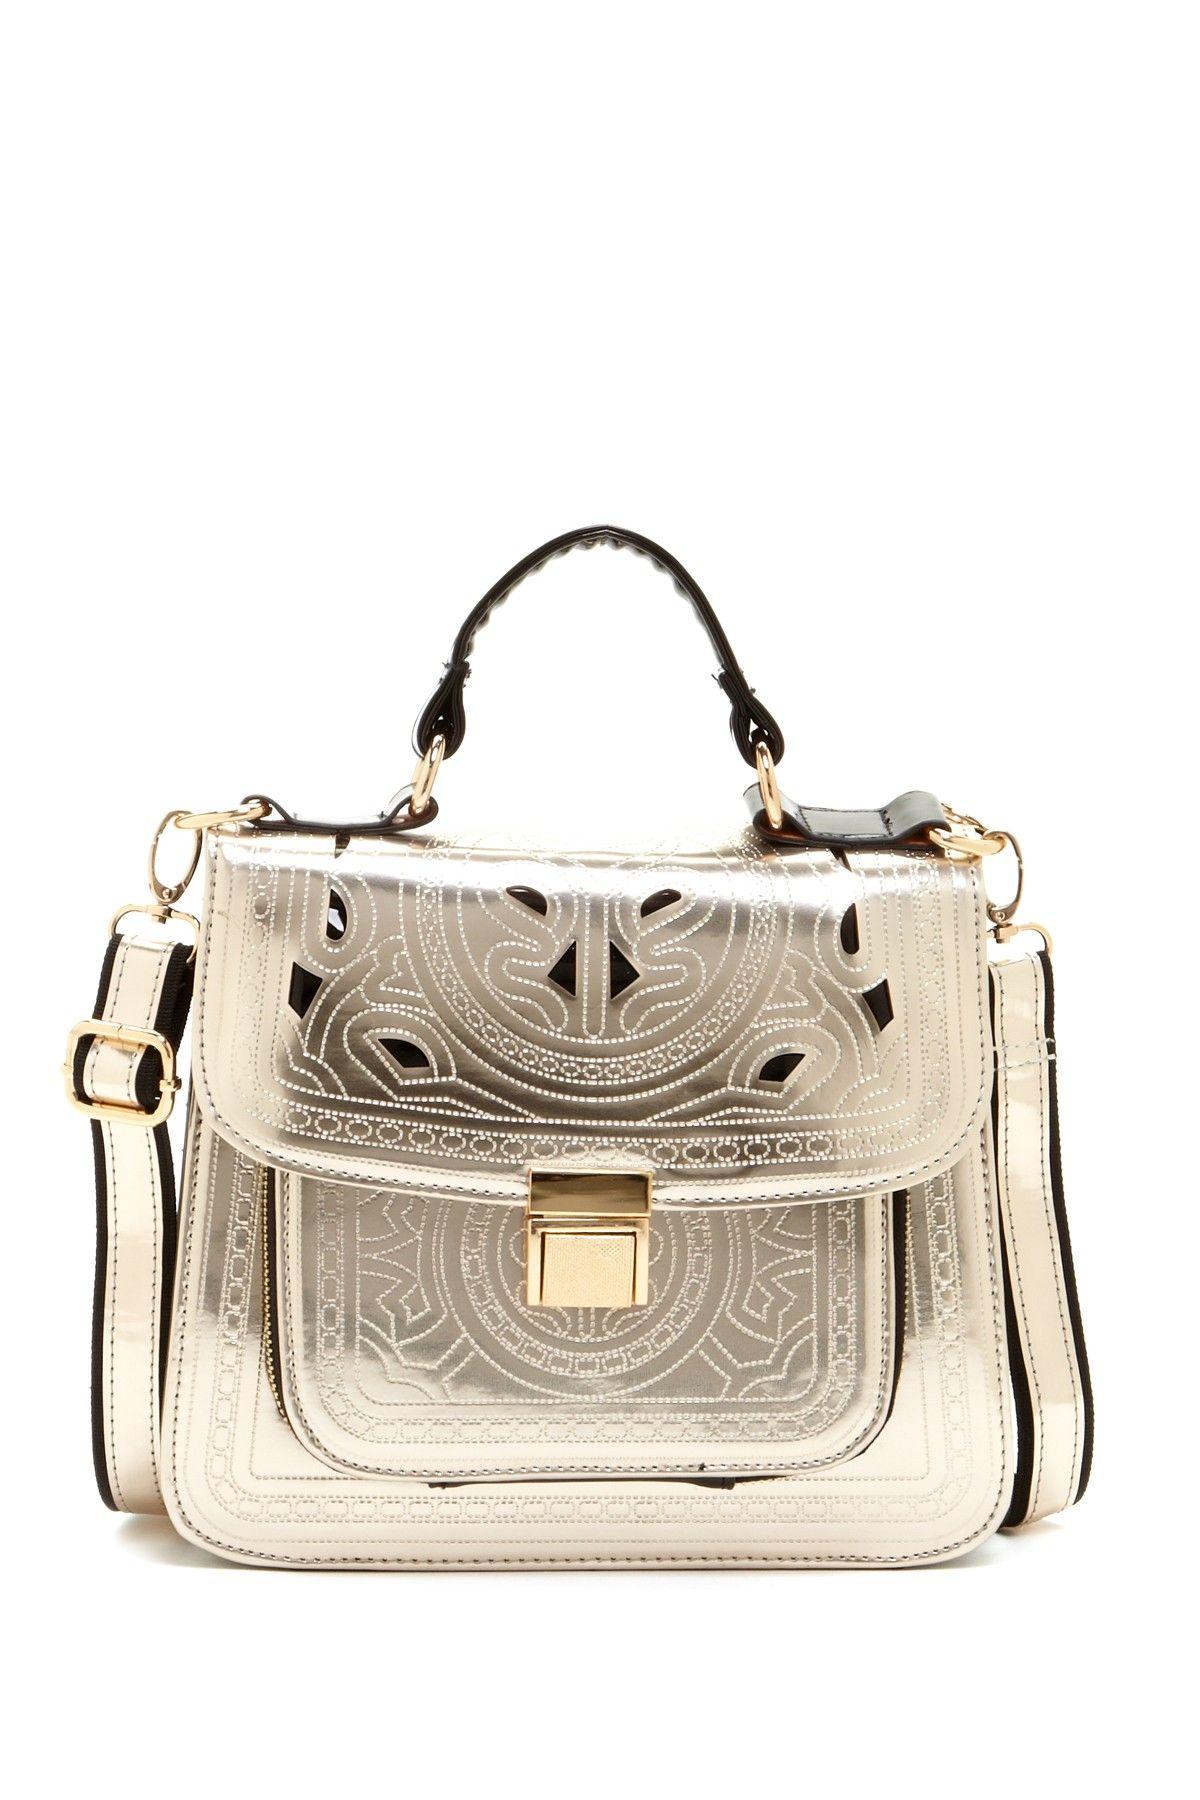 ed316cc54f48 www.designerclan com cheap designer handbags online outlet